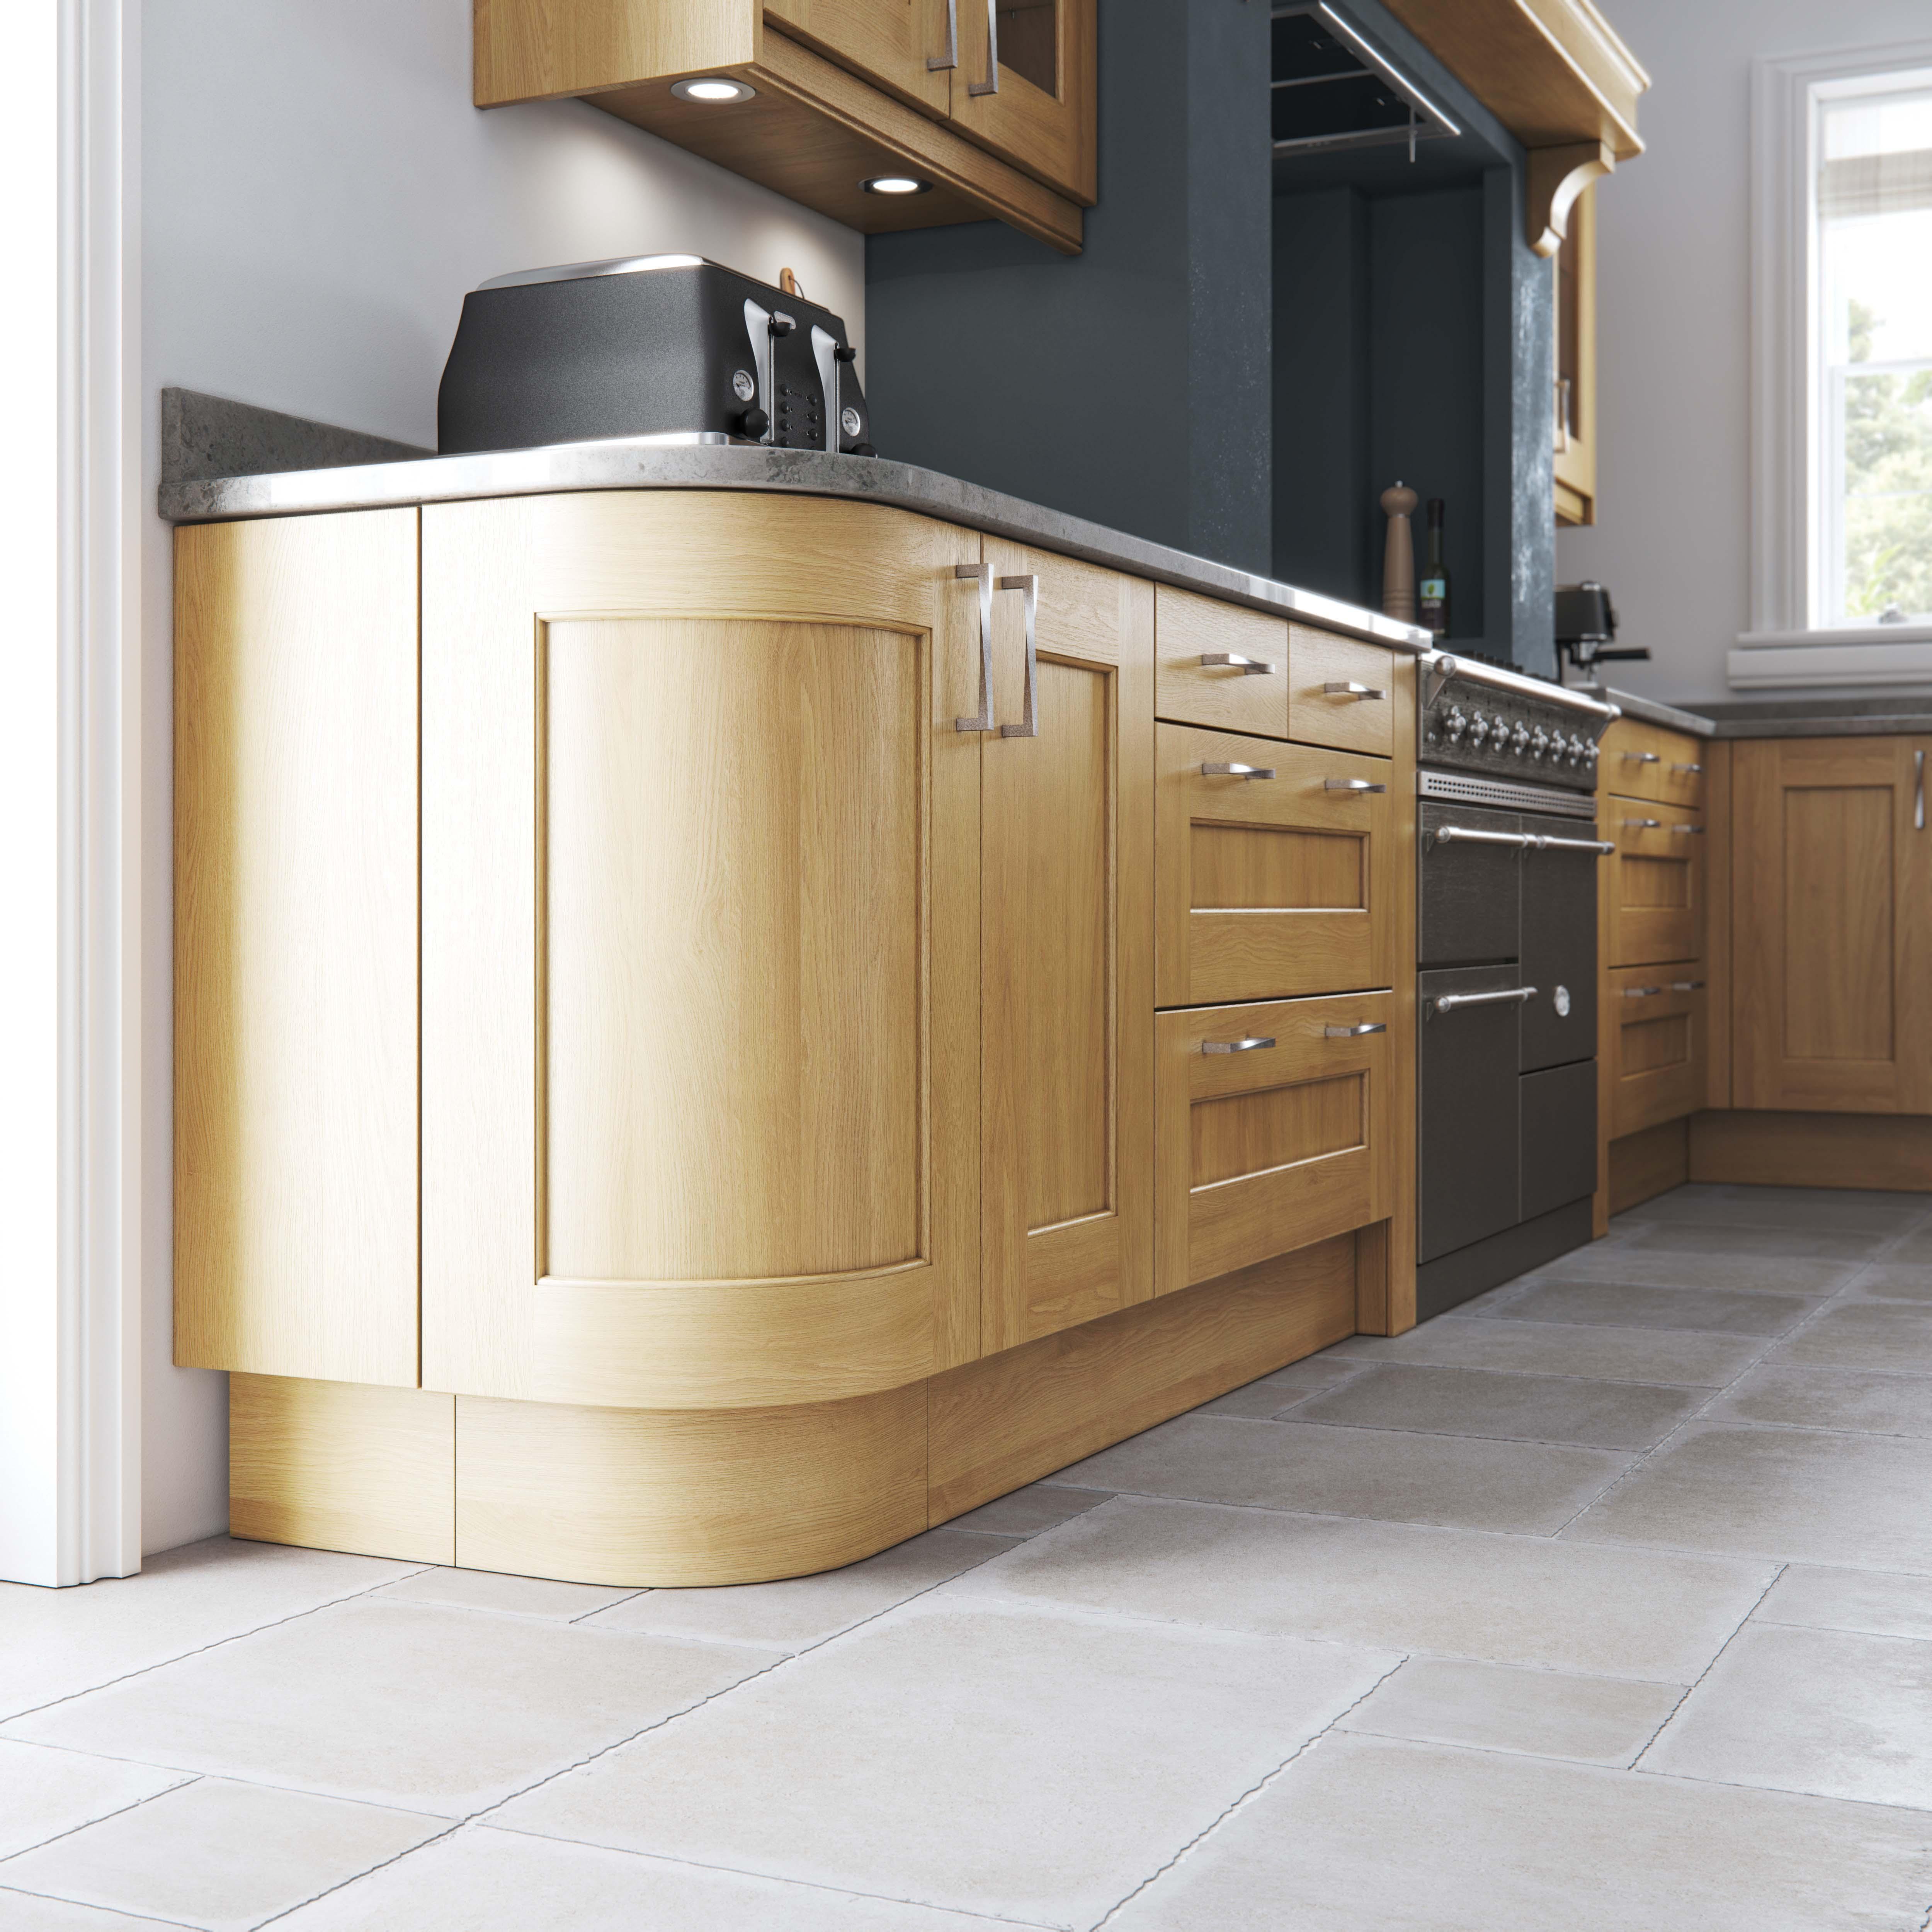 Purley kitchen Crestwood of Lymington